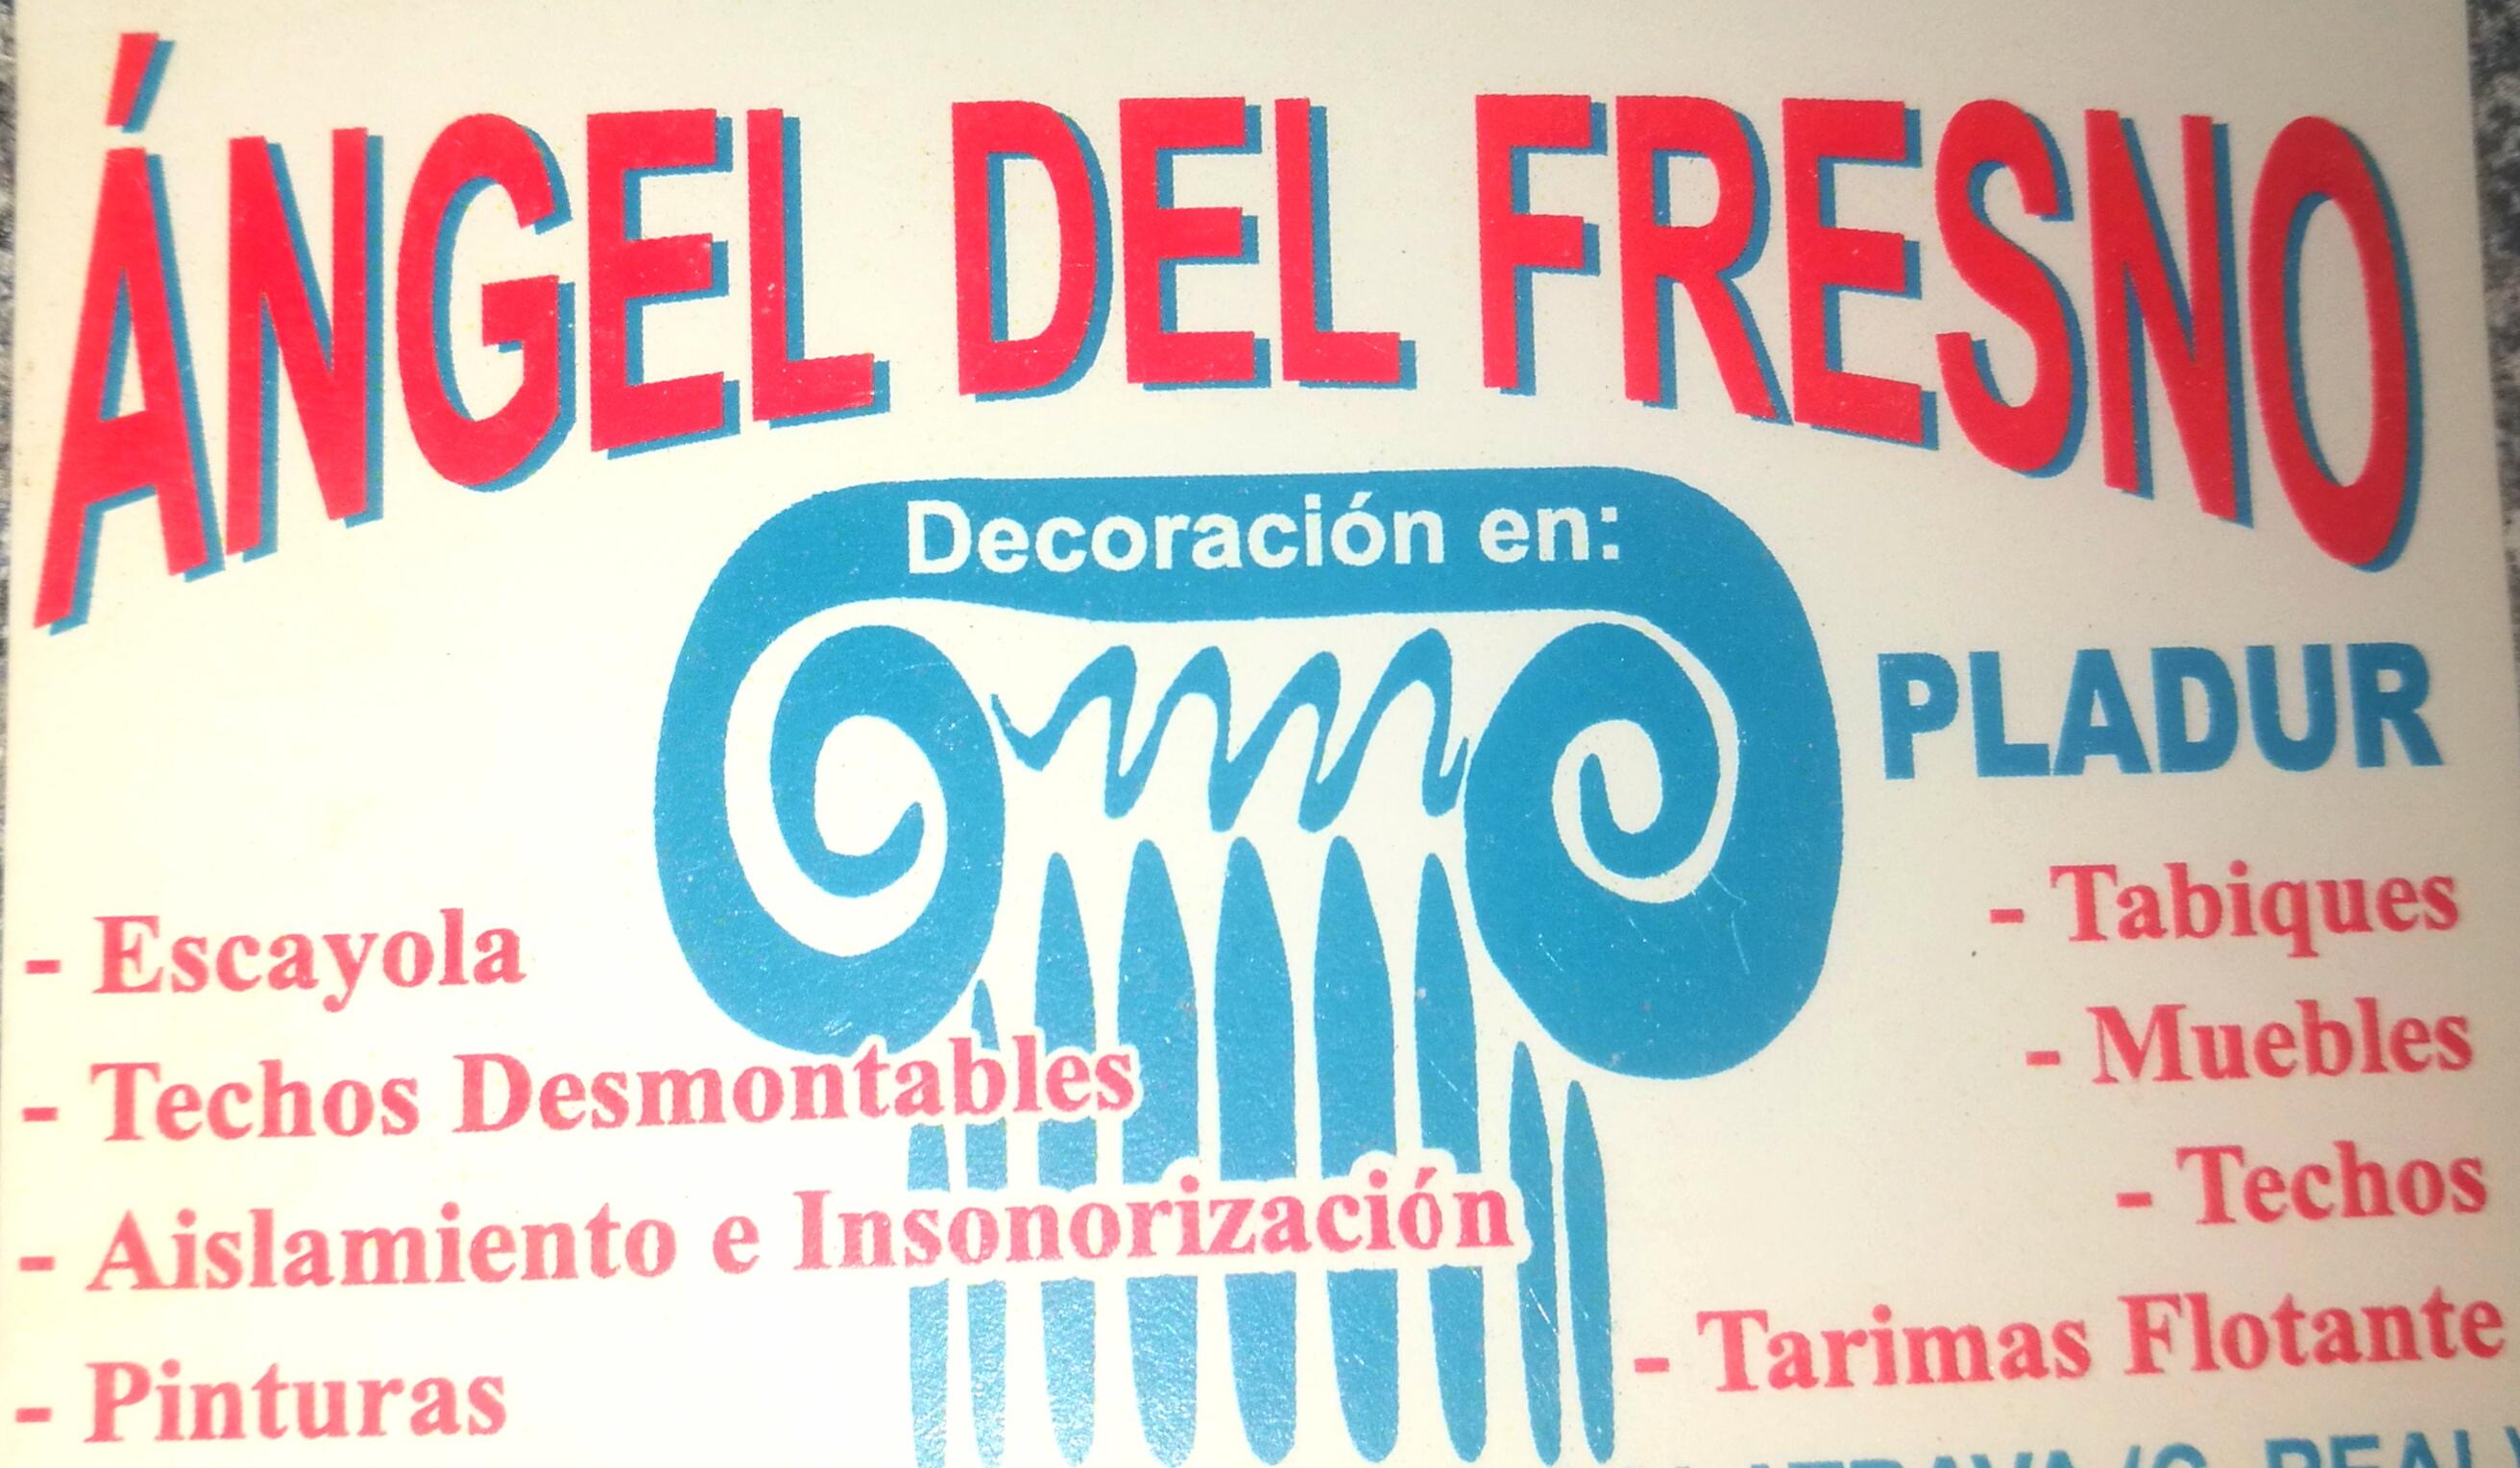 Angel Del Fresno